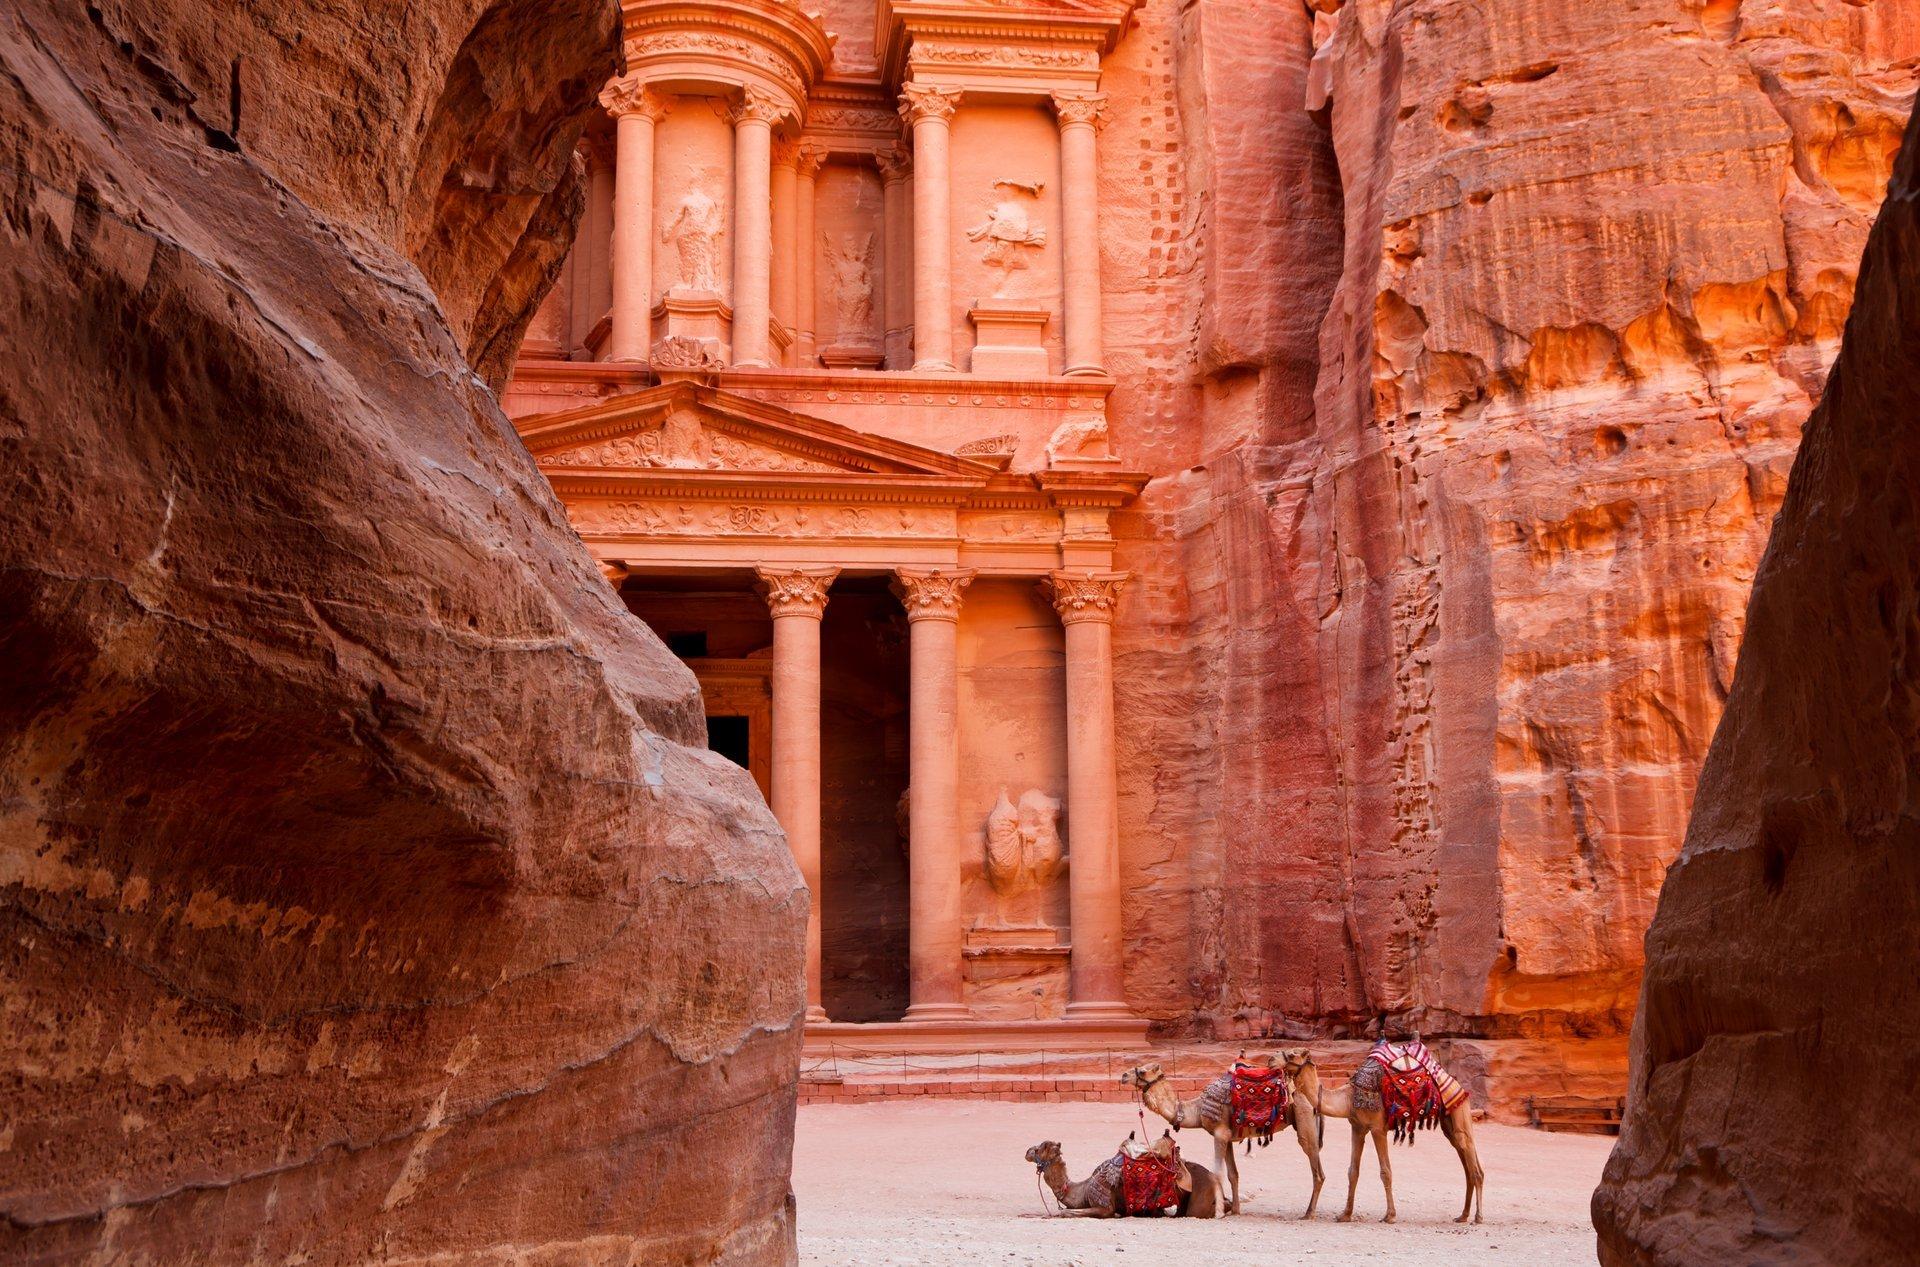 Ancient City of Petra in Jordan 2019 - Best Time